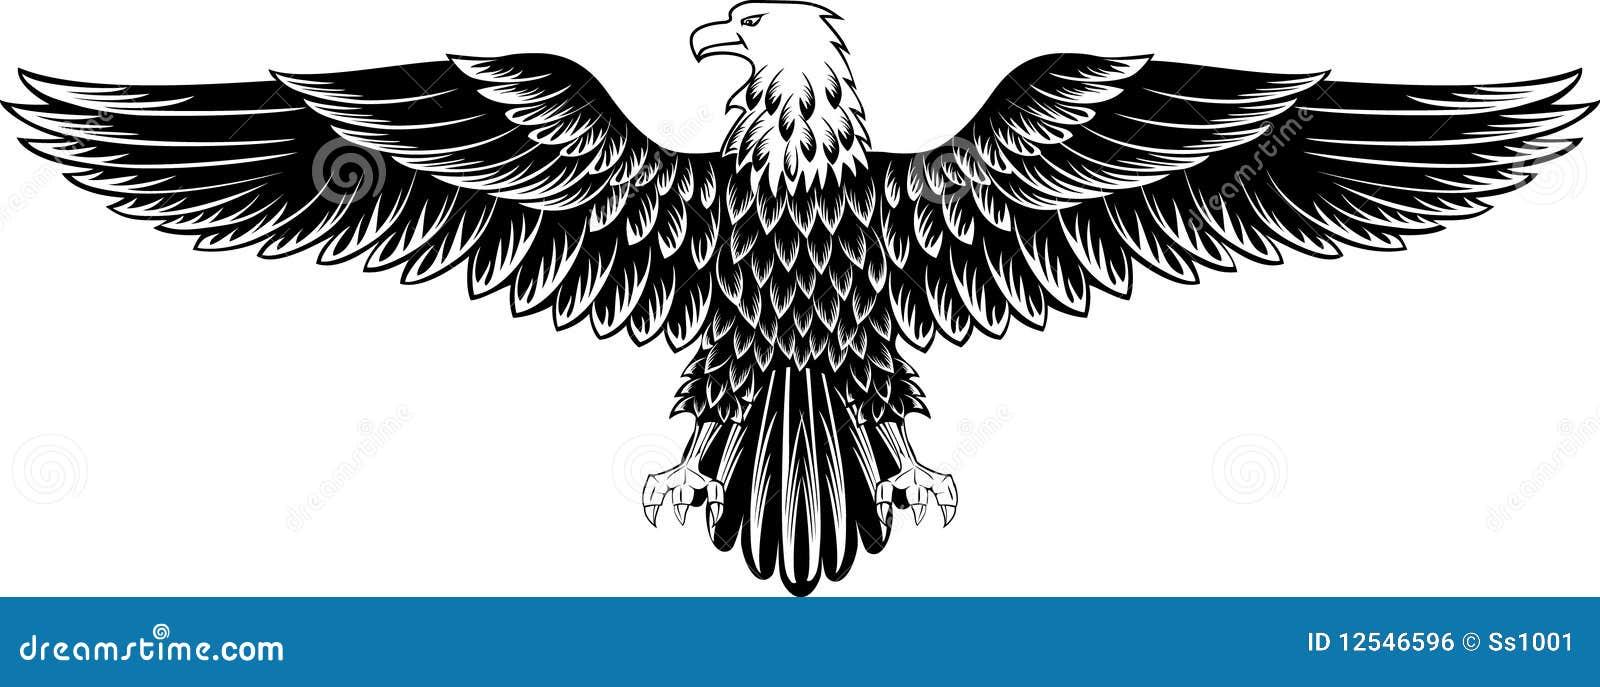 vector eagle wings stock illustrations 12 774 vector eagle wings stock illustrations vectors clipart dreamstime dreamstime com